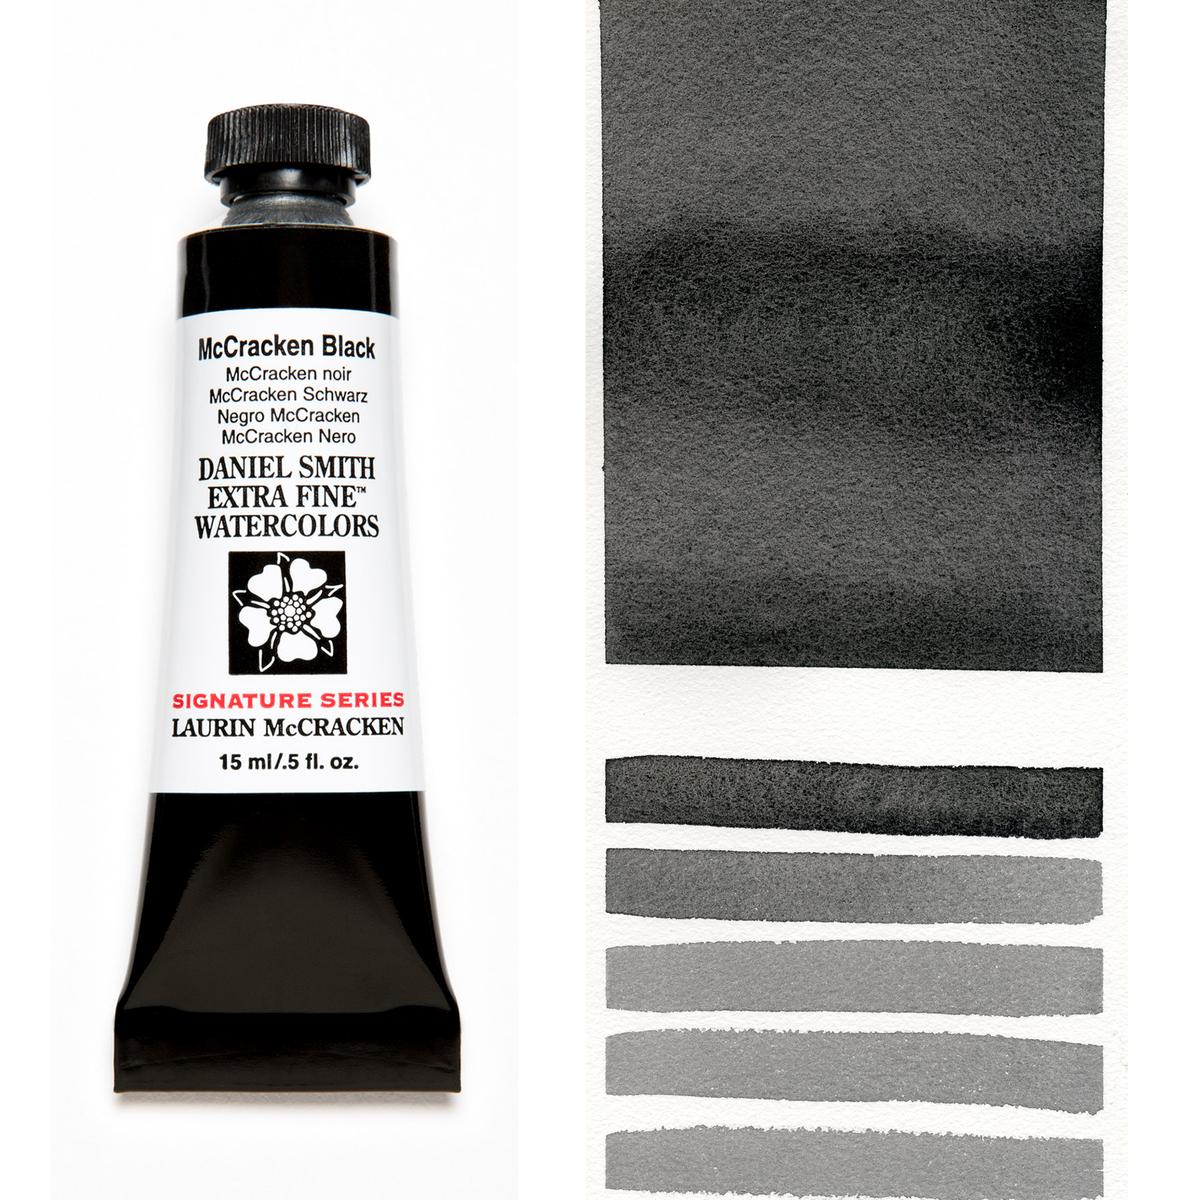 DANIEL 注目ブランド SMITH マクラッケンブラック McCracken まとめ買い特価 Black 15mlチューブ 水彩絵具 ダニエル スミス